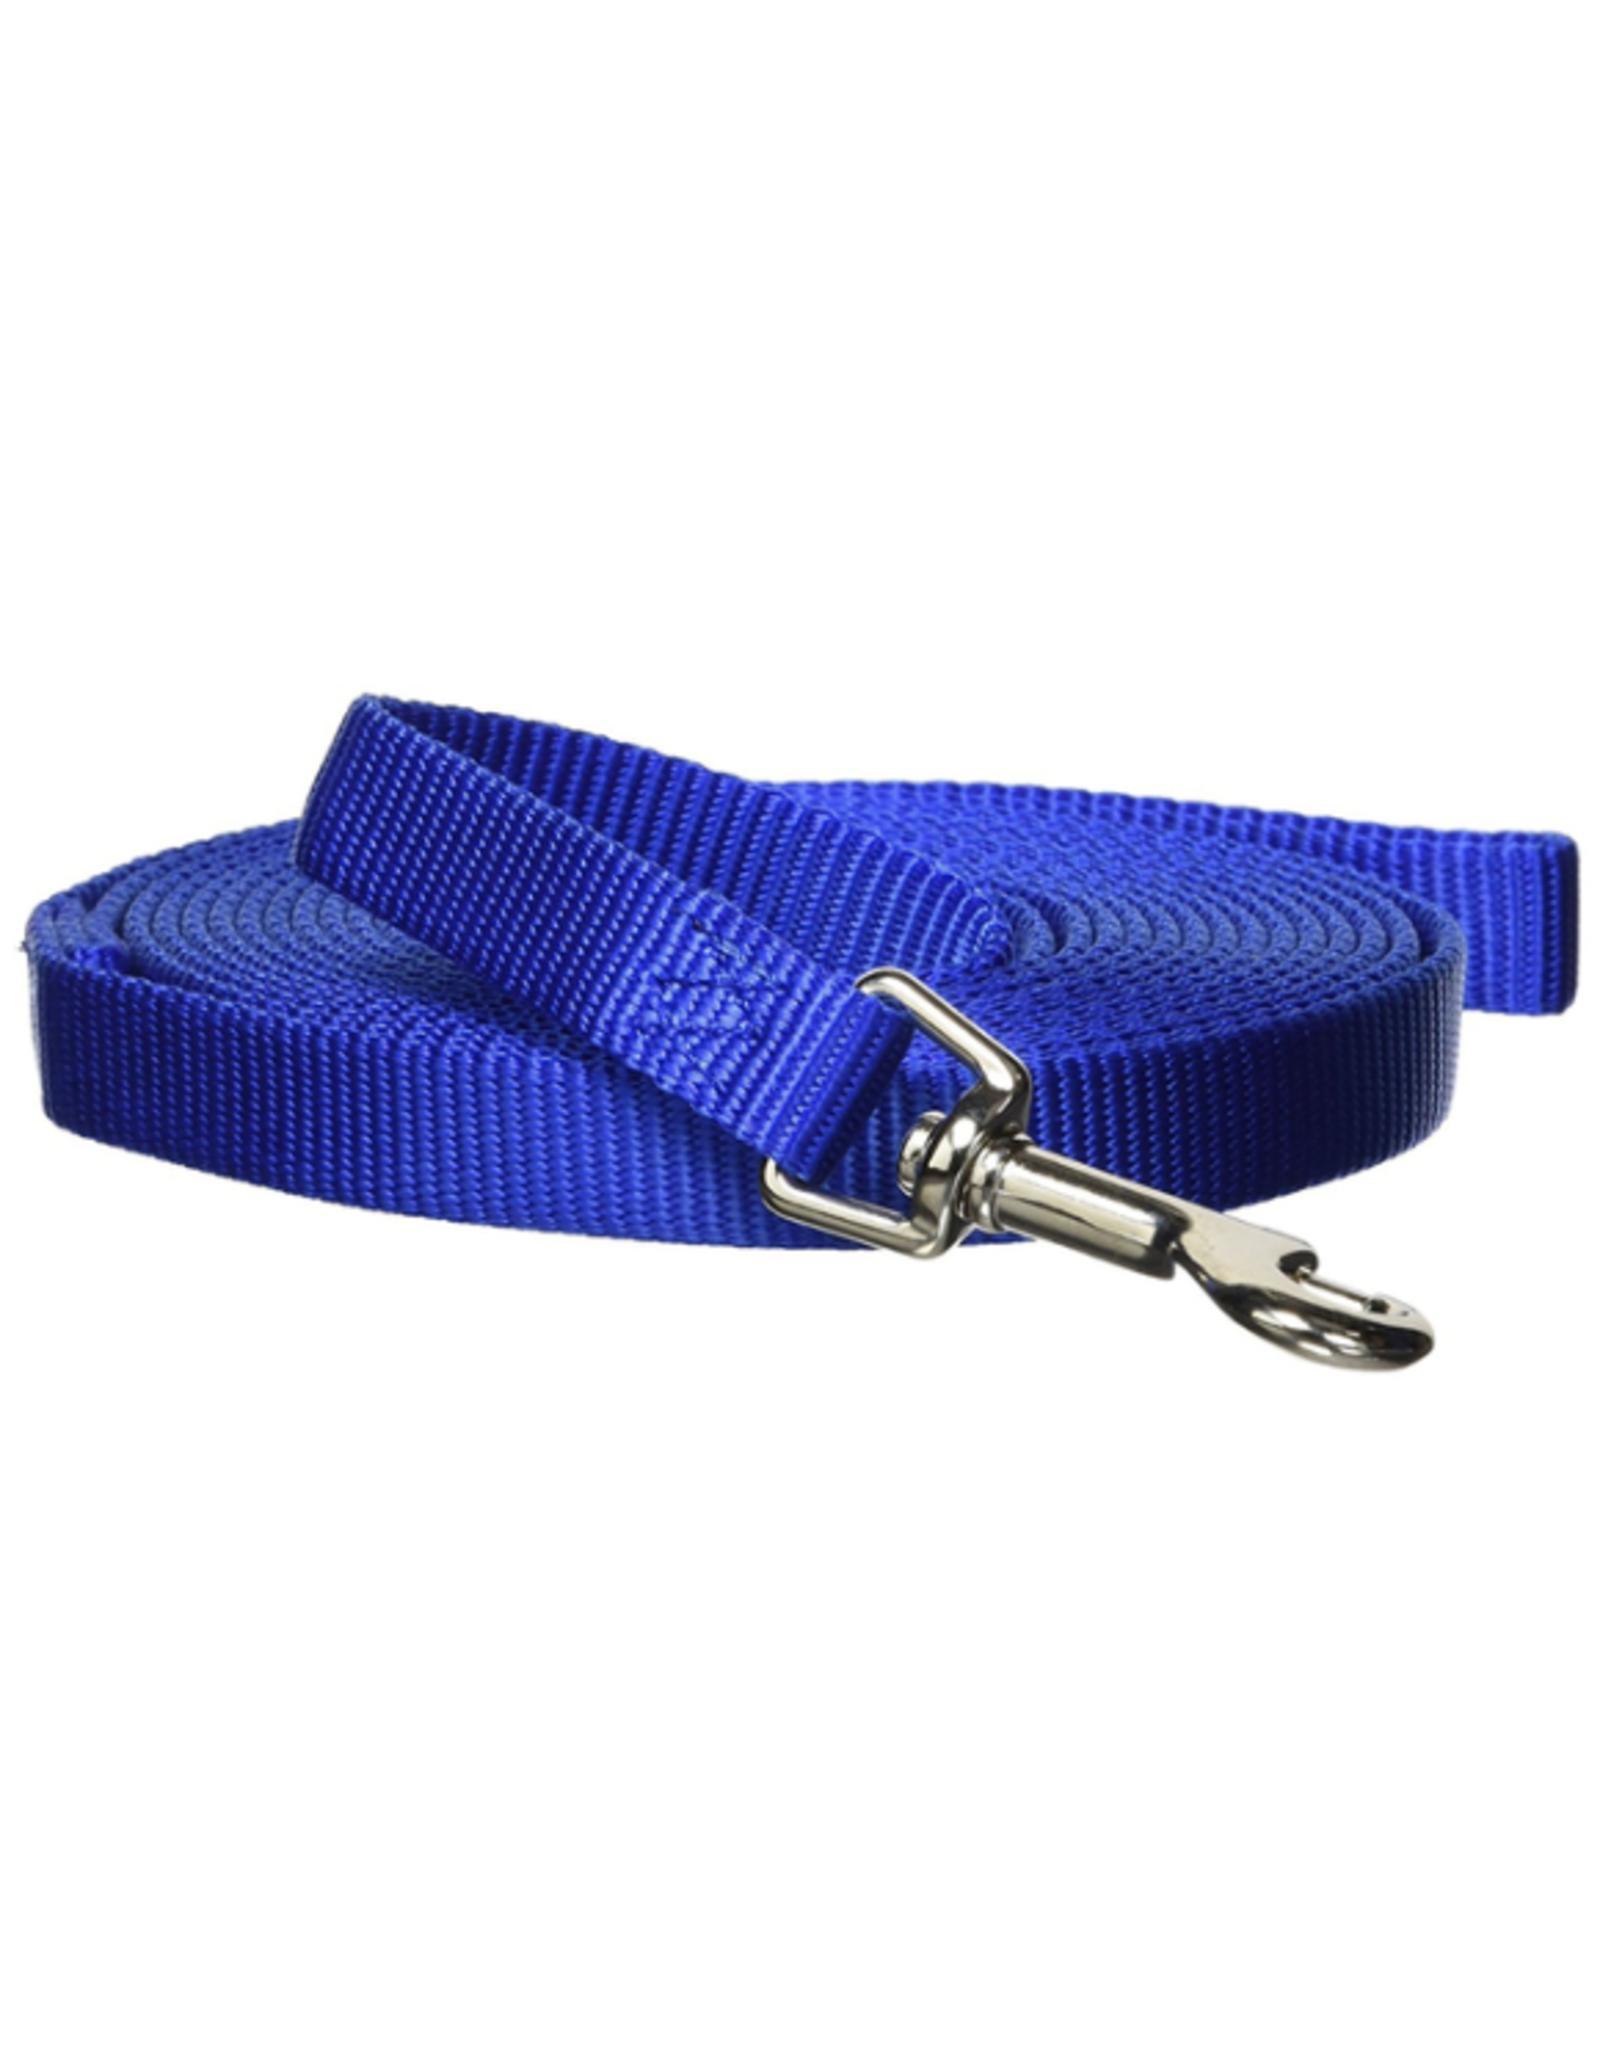 Hamilton Training Dog Lead, Blue Image